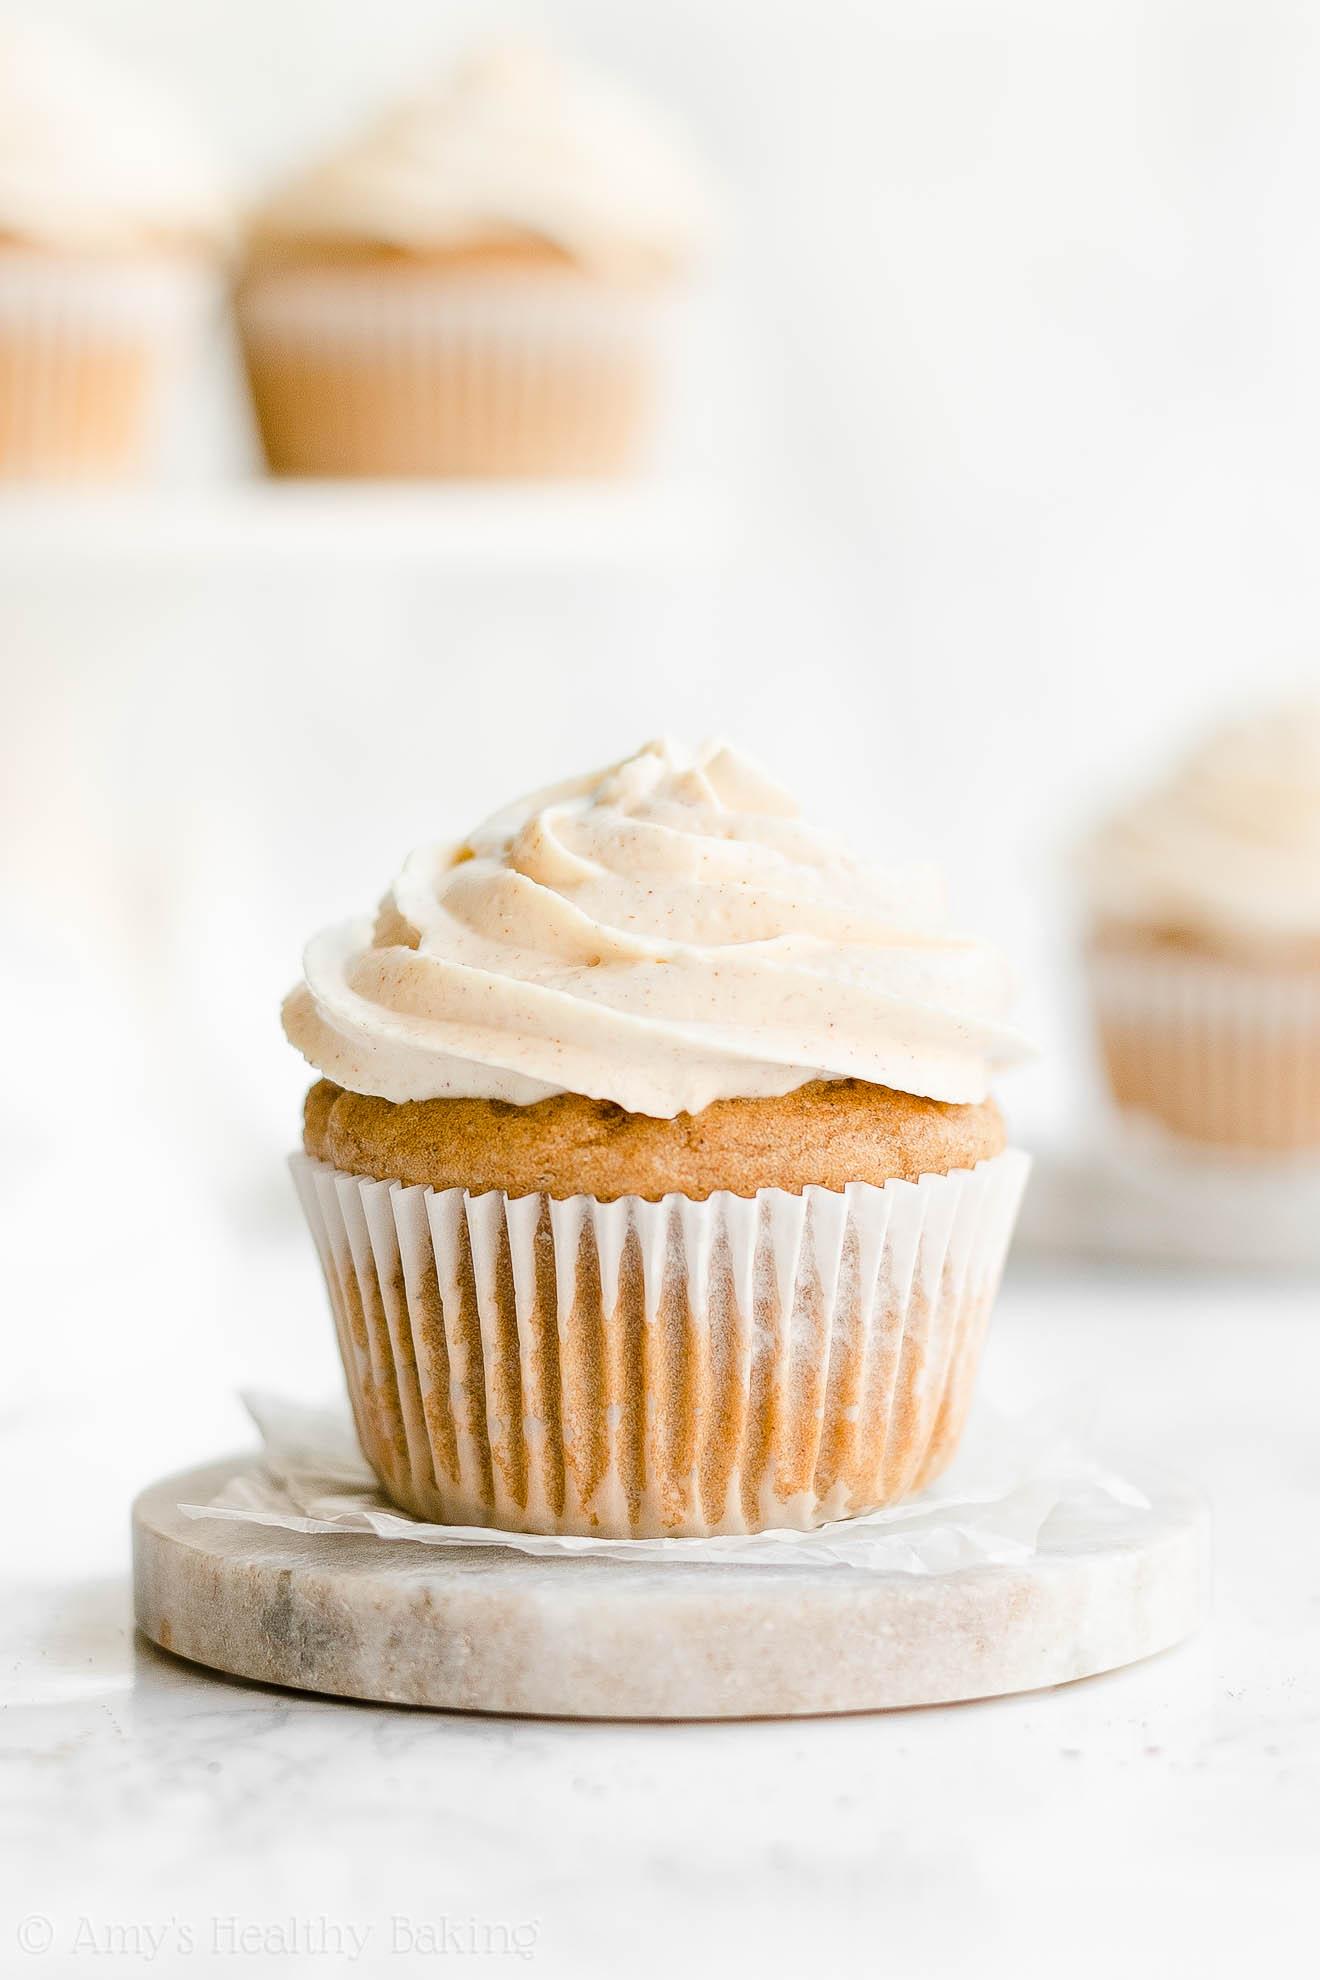 Easy Healthy Whole Wheat Eggnog Cupcakes with Greek Yogurt Frosting